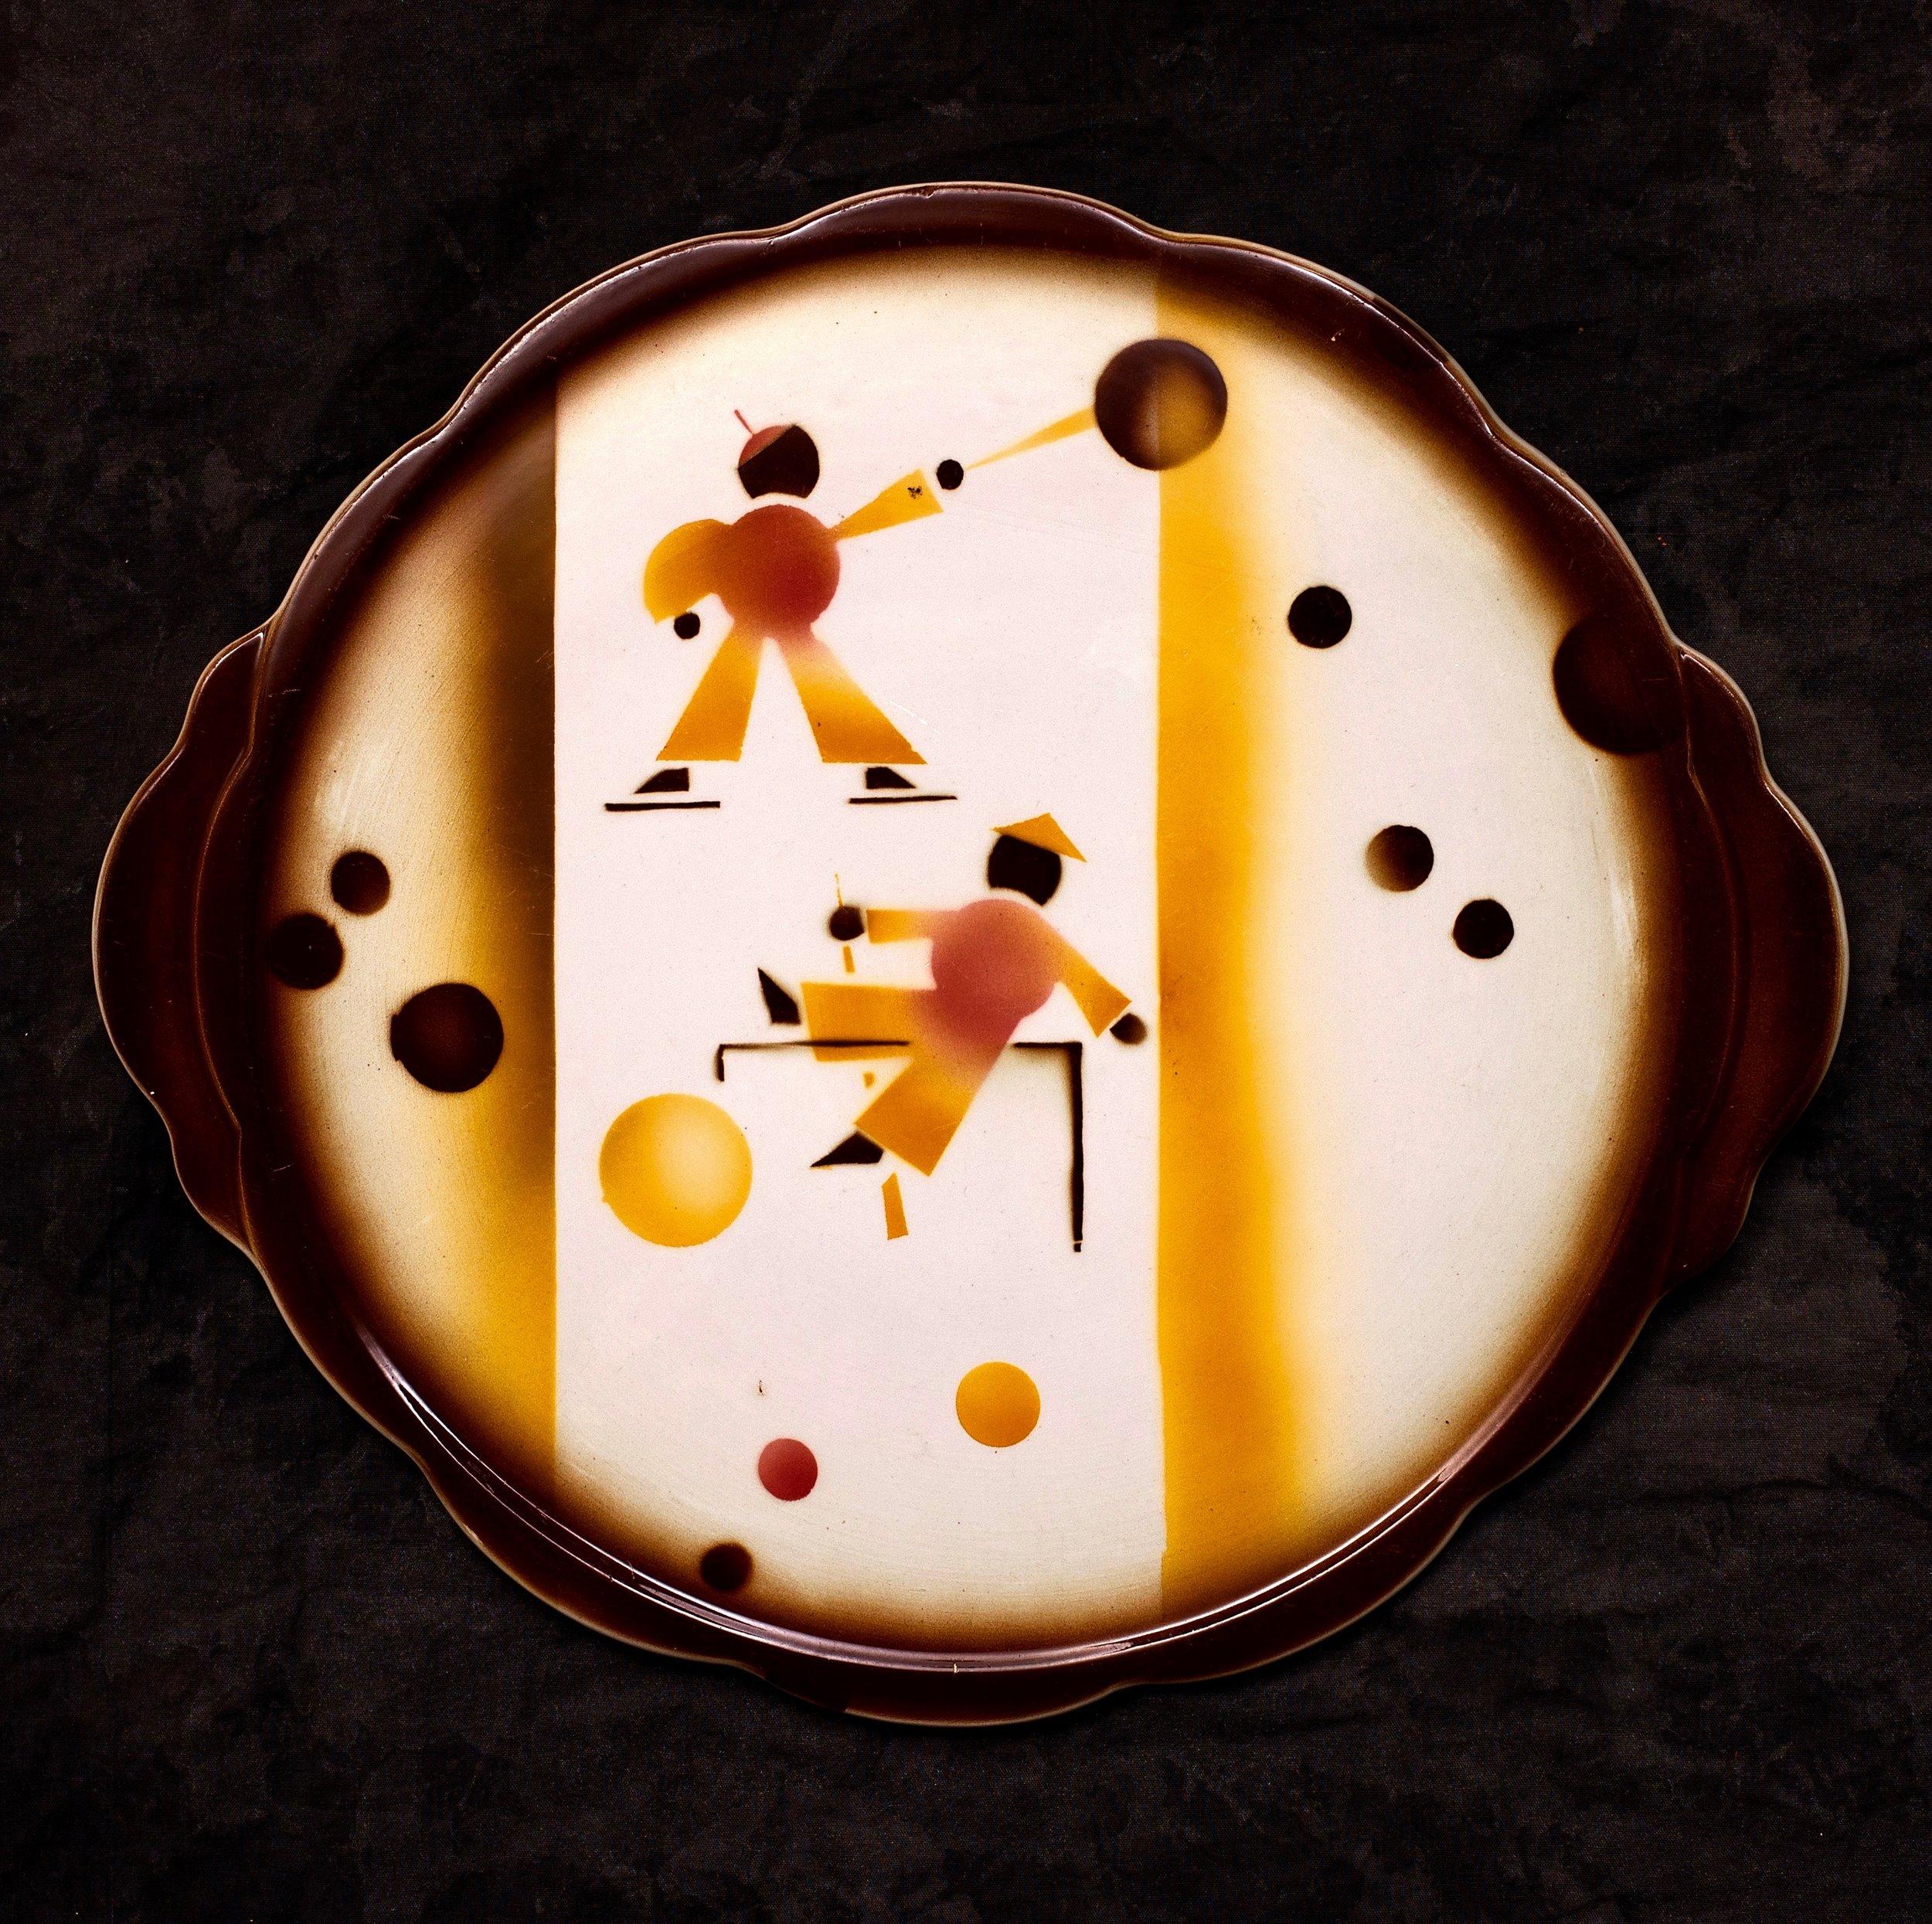 #47 Platter, form 15, dec.4749, Colditz, ca.1931. Black 4749; Blind 15; .8 cm H, 30 cm top, 25.5 cm base Ø. RM1383